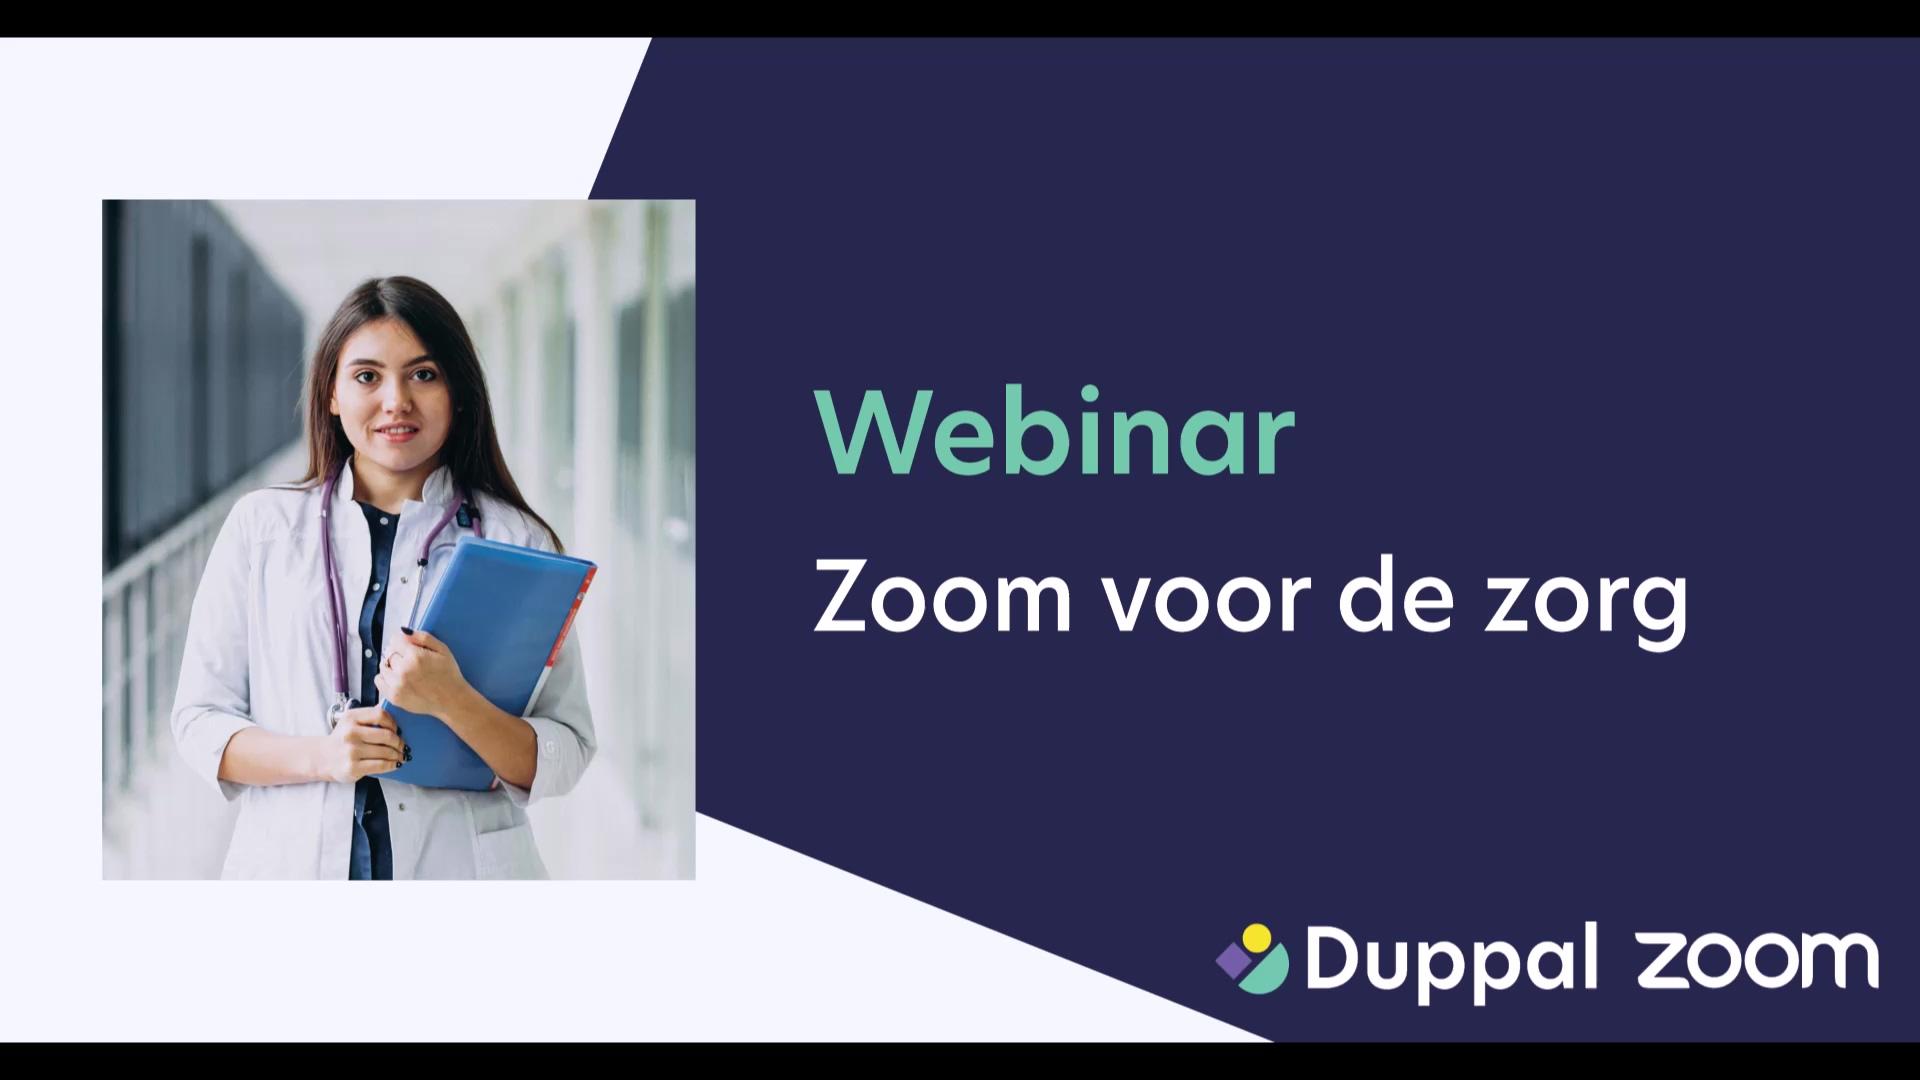 Duppal webinar - Zoom zorg